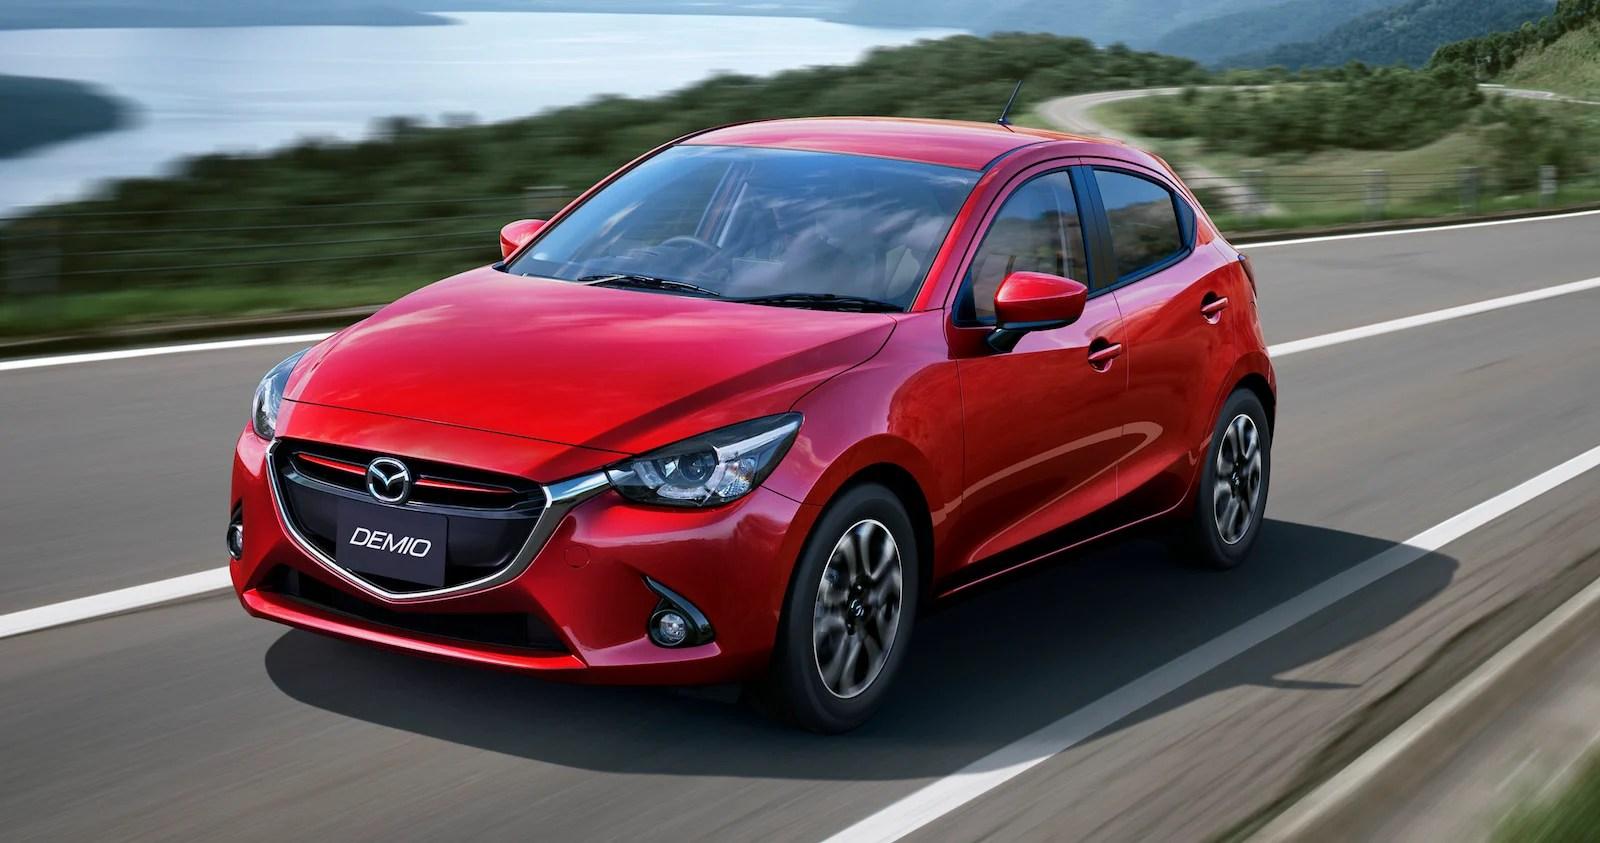 2015 Mazda 2 New Details Of Third Generation City Car